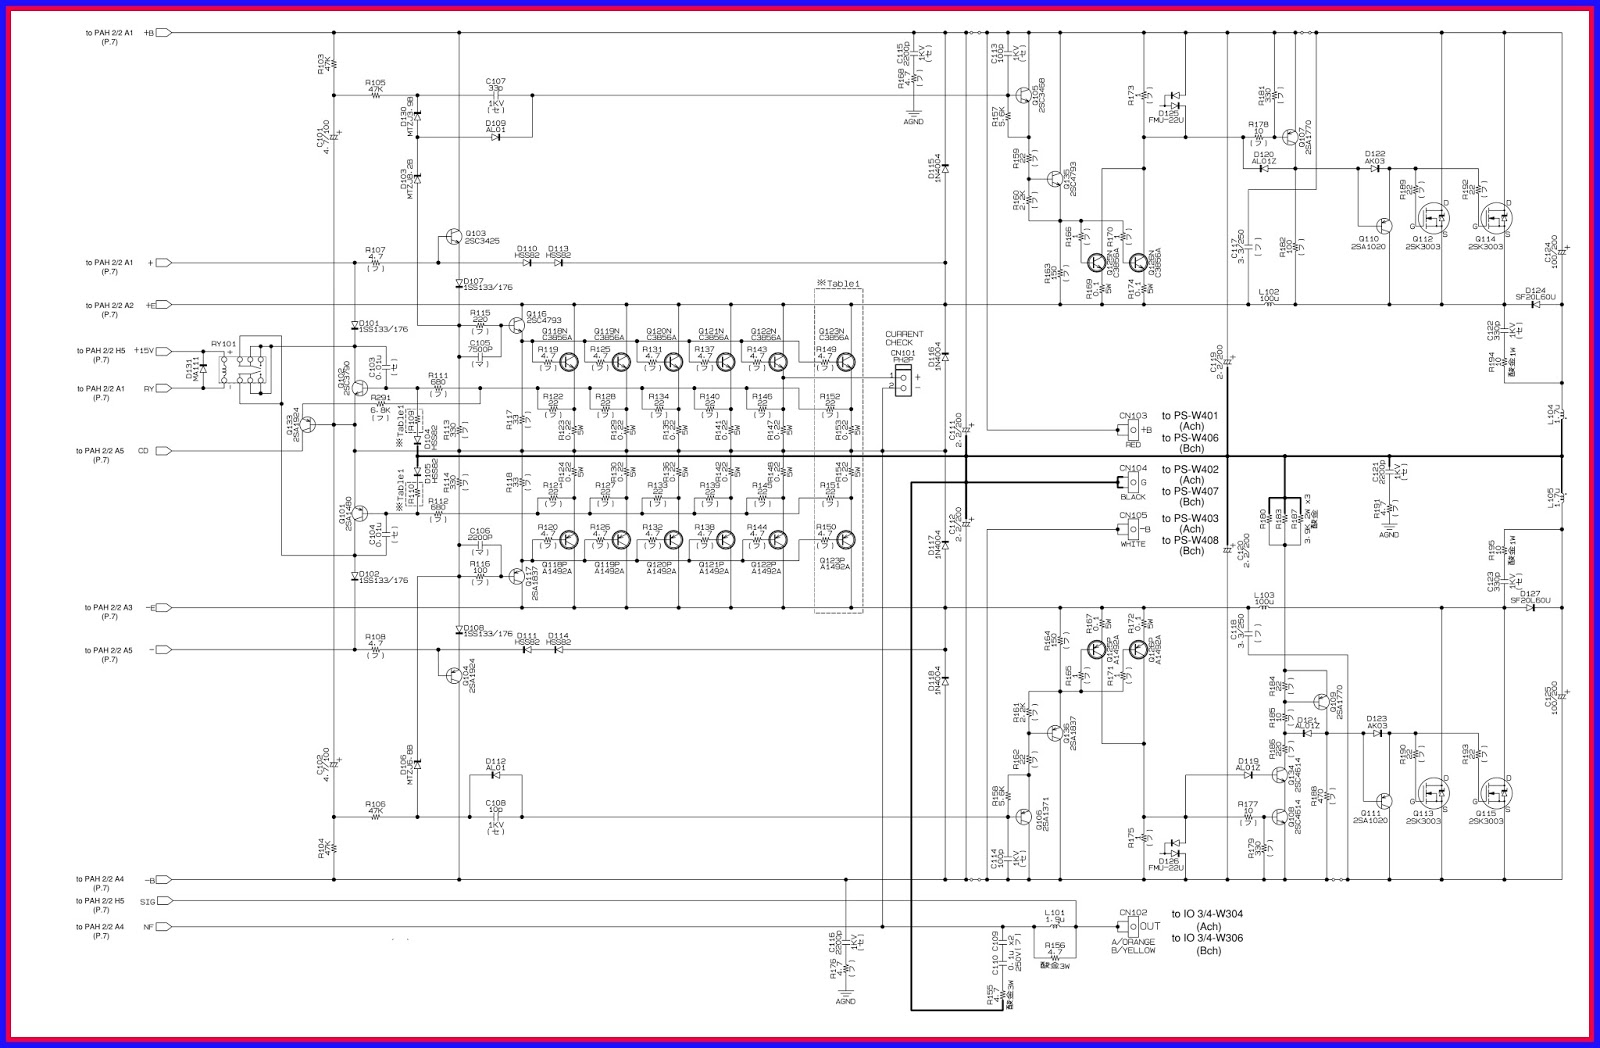 yamaha amp schematic wiring diagram technicyamaha amp schematic wiring diagram insideyamaha amp schematic wiring diagram expert [ 1600 x 1048 Pixel ]